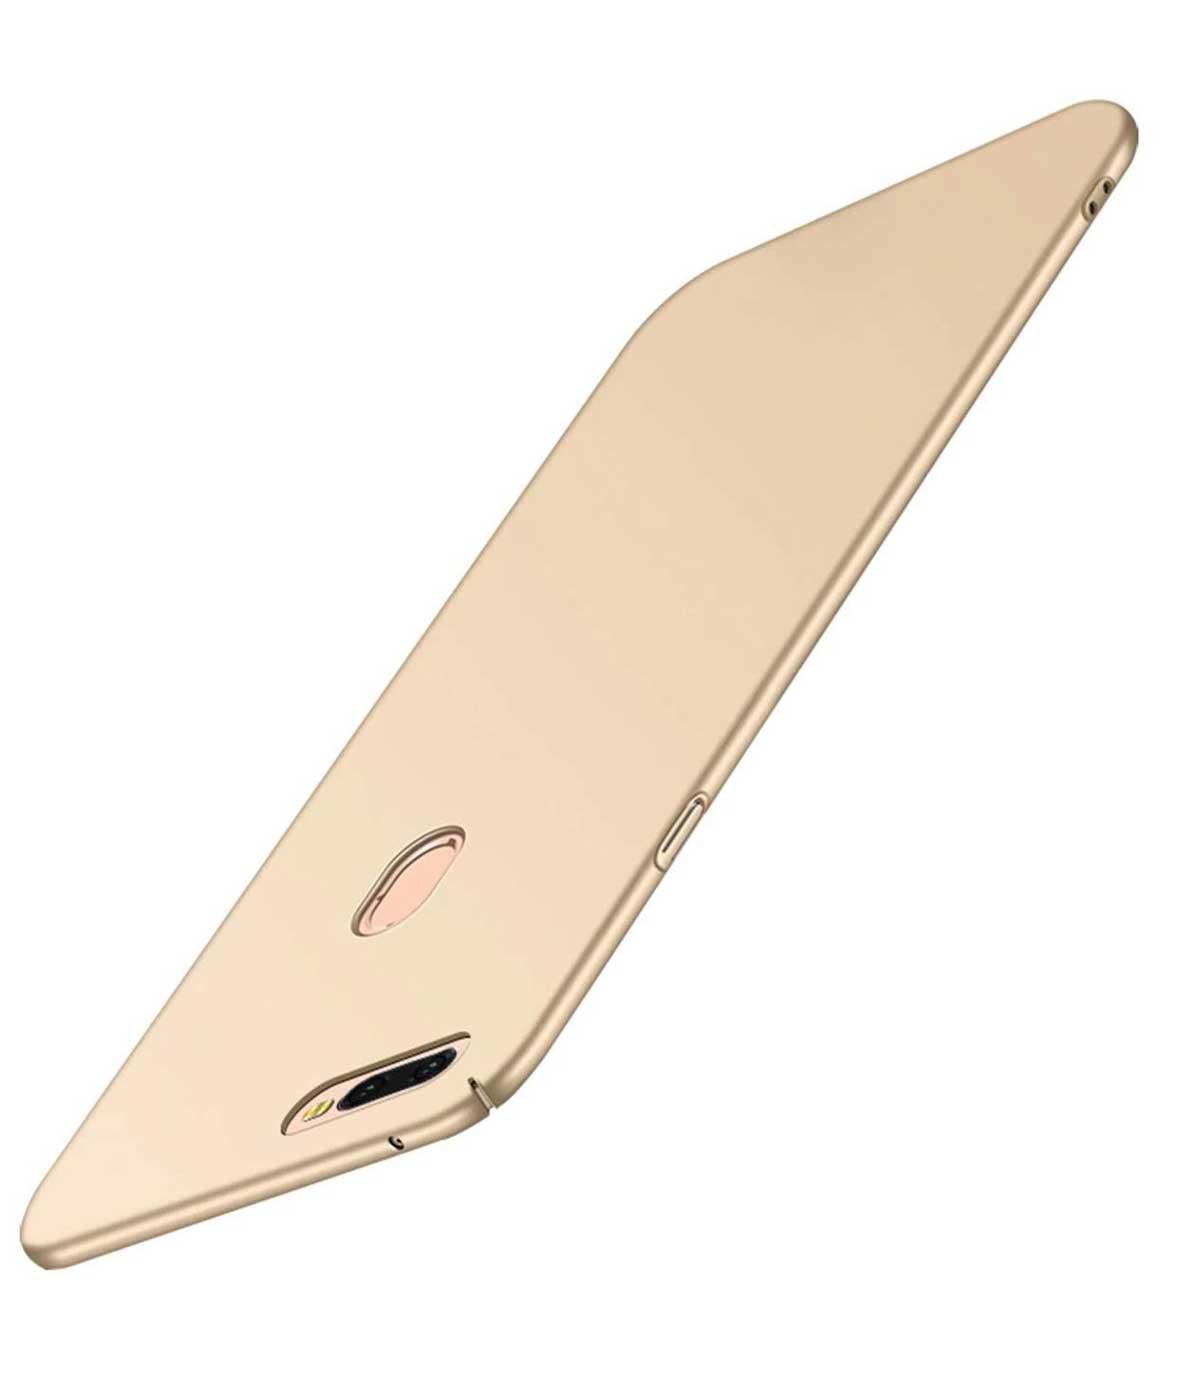 TBZ Hard Back Case Cover for Realme 2 Pro  Golden